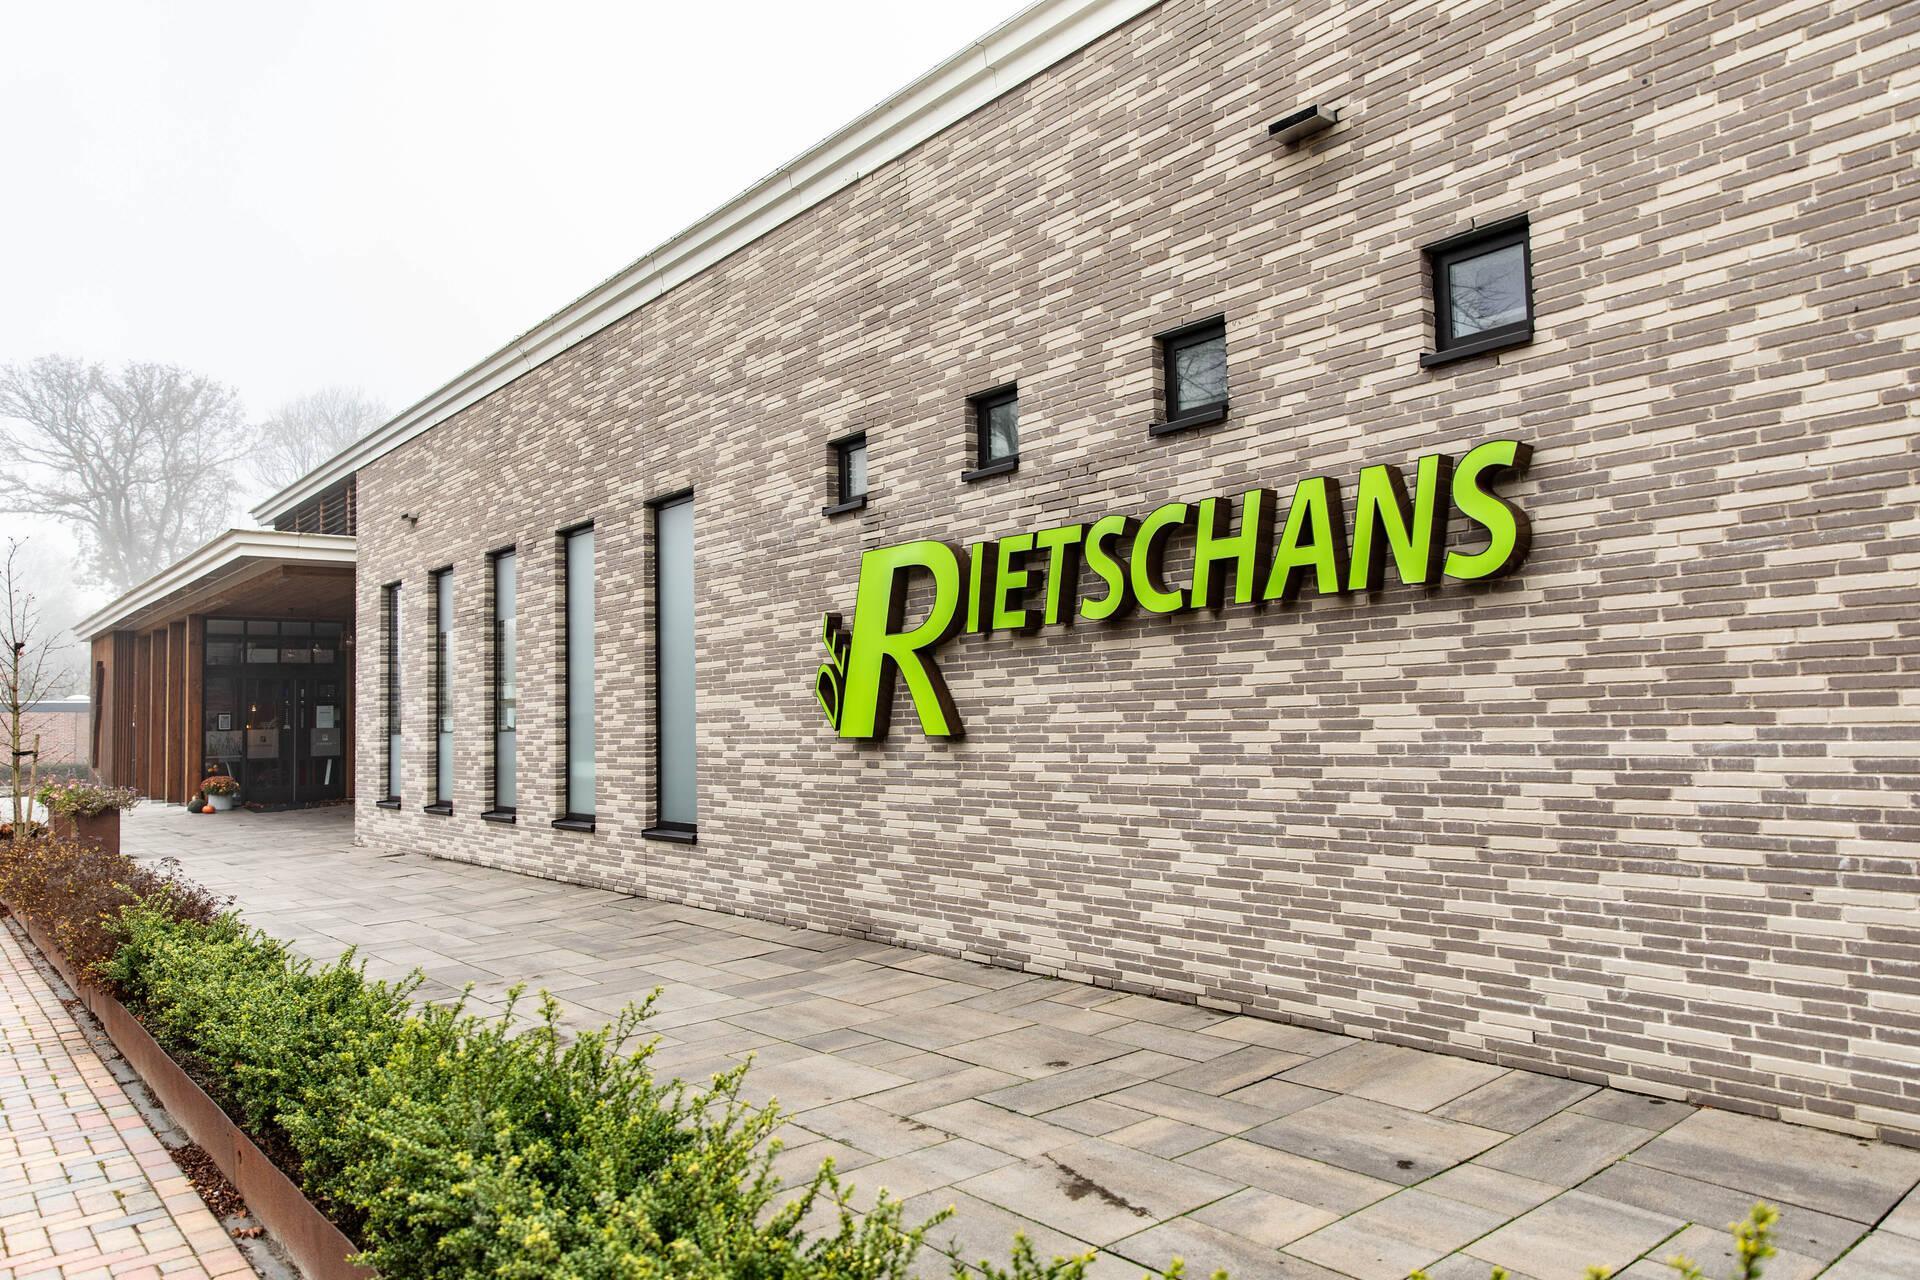 Restaurant De Rietschans